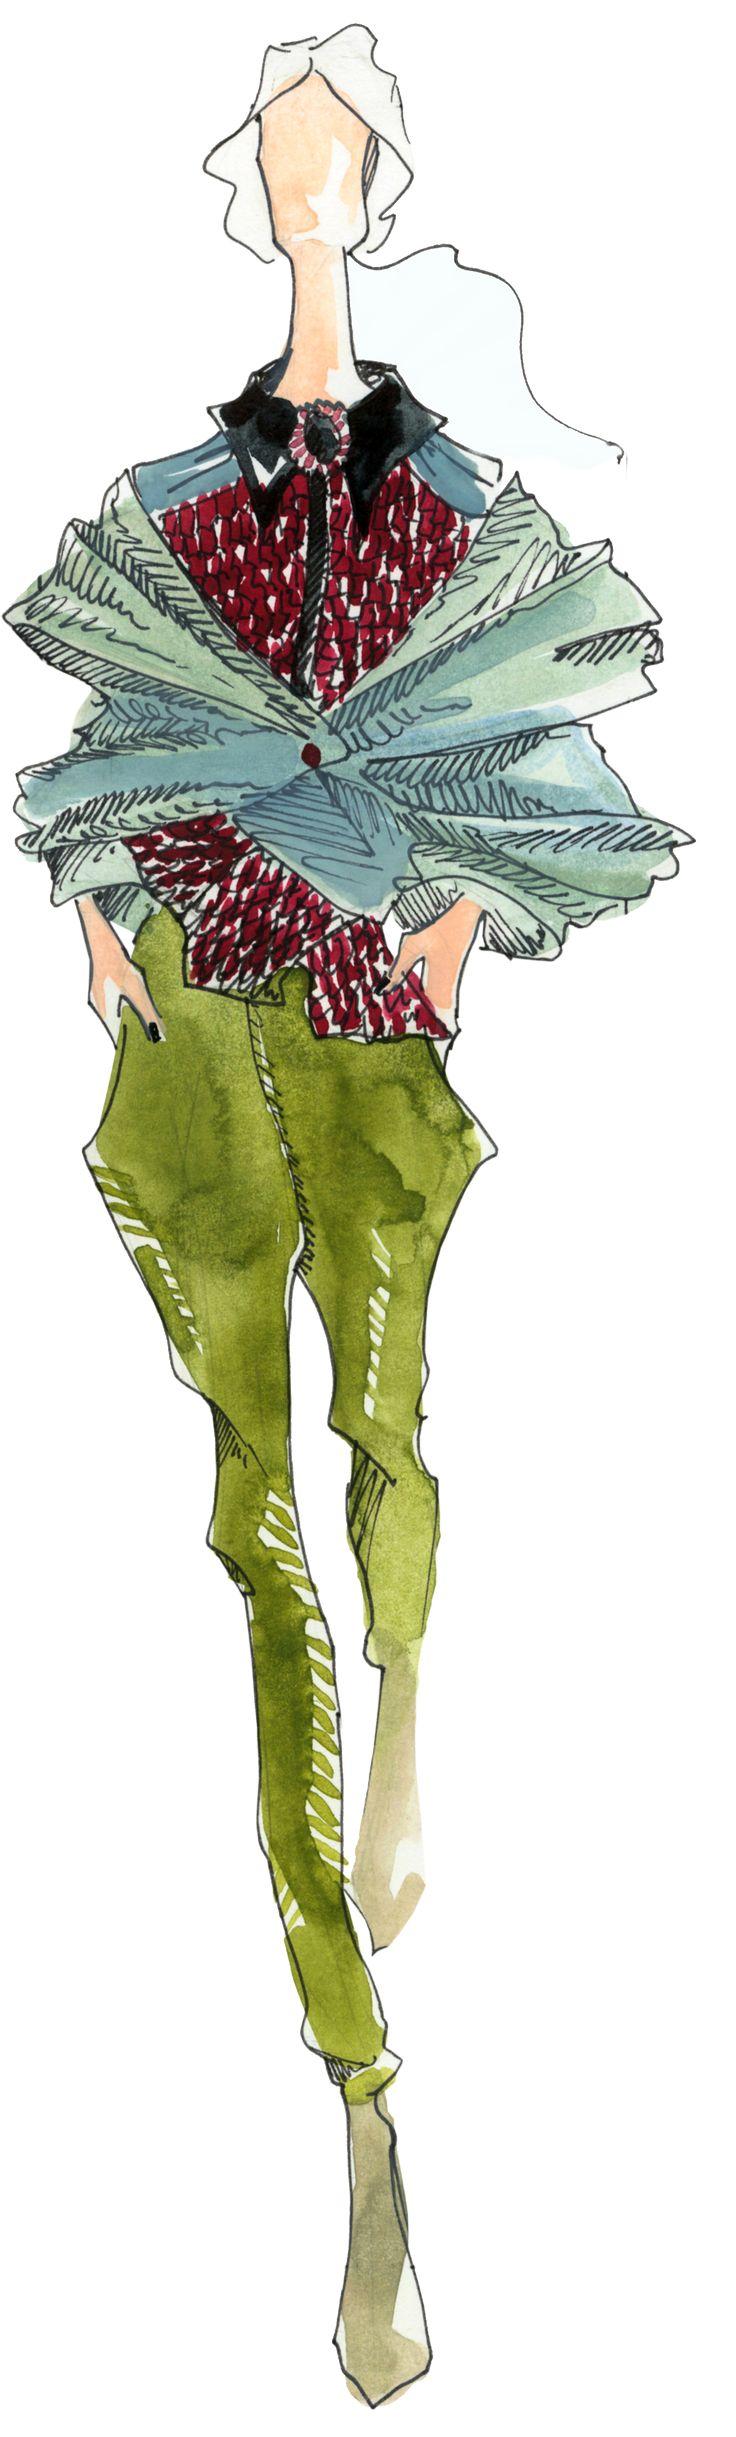 #olgako #fashionillustration #illustration #watercolor #aquarelle #sketch #sketchbook #drawing #magazine #blackandwhite #style #vogue #artist #artwork #streetstyle #editorial #art #streetphotography #inspiration #model #streetfashion #artist #digitalart #creator #top #girl #beautiful #look #hair #woman #instafashion #fashionblogger #mensfashion #fashionable #womensfashion #fashionweek #fashionphotography #highfashion #fashionshow #fashiondaily #comics #graphicart #picture #coloredhair #dress